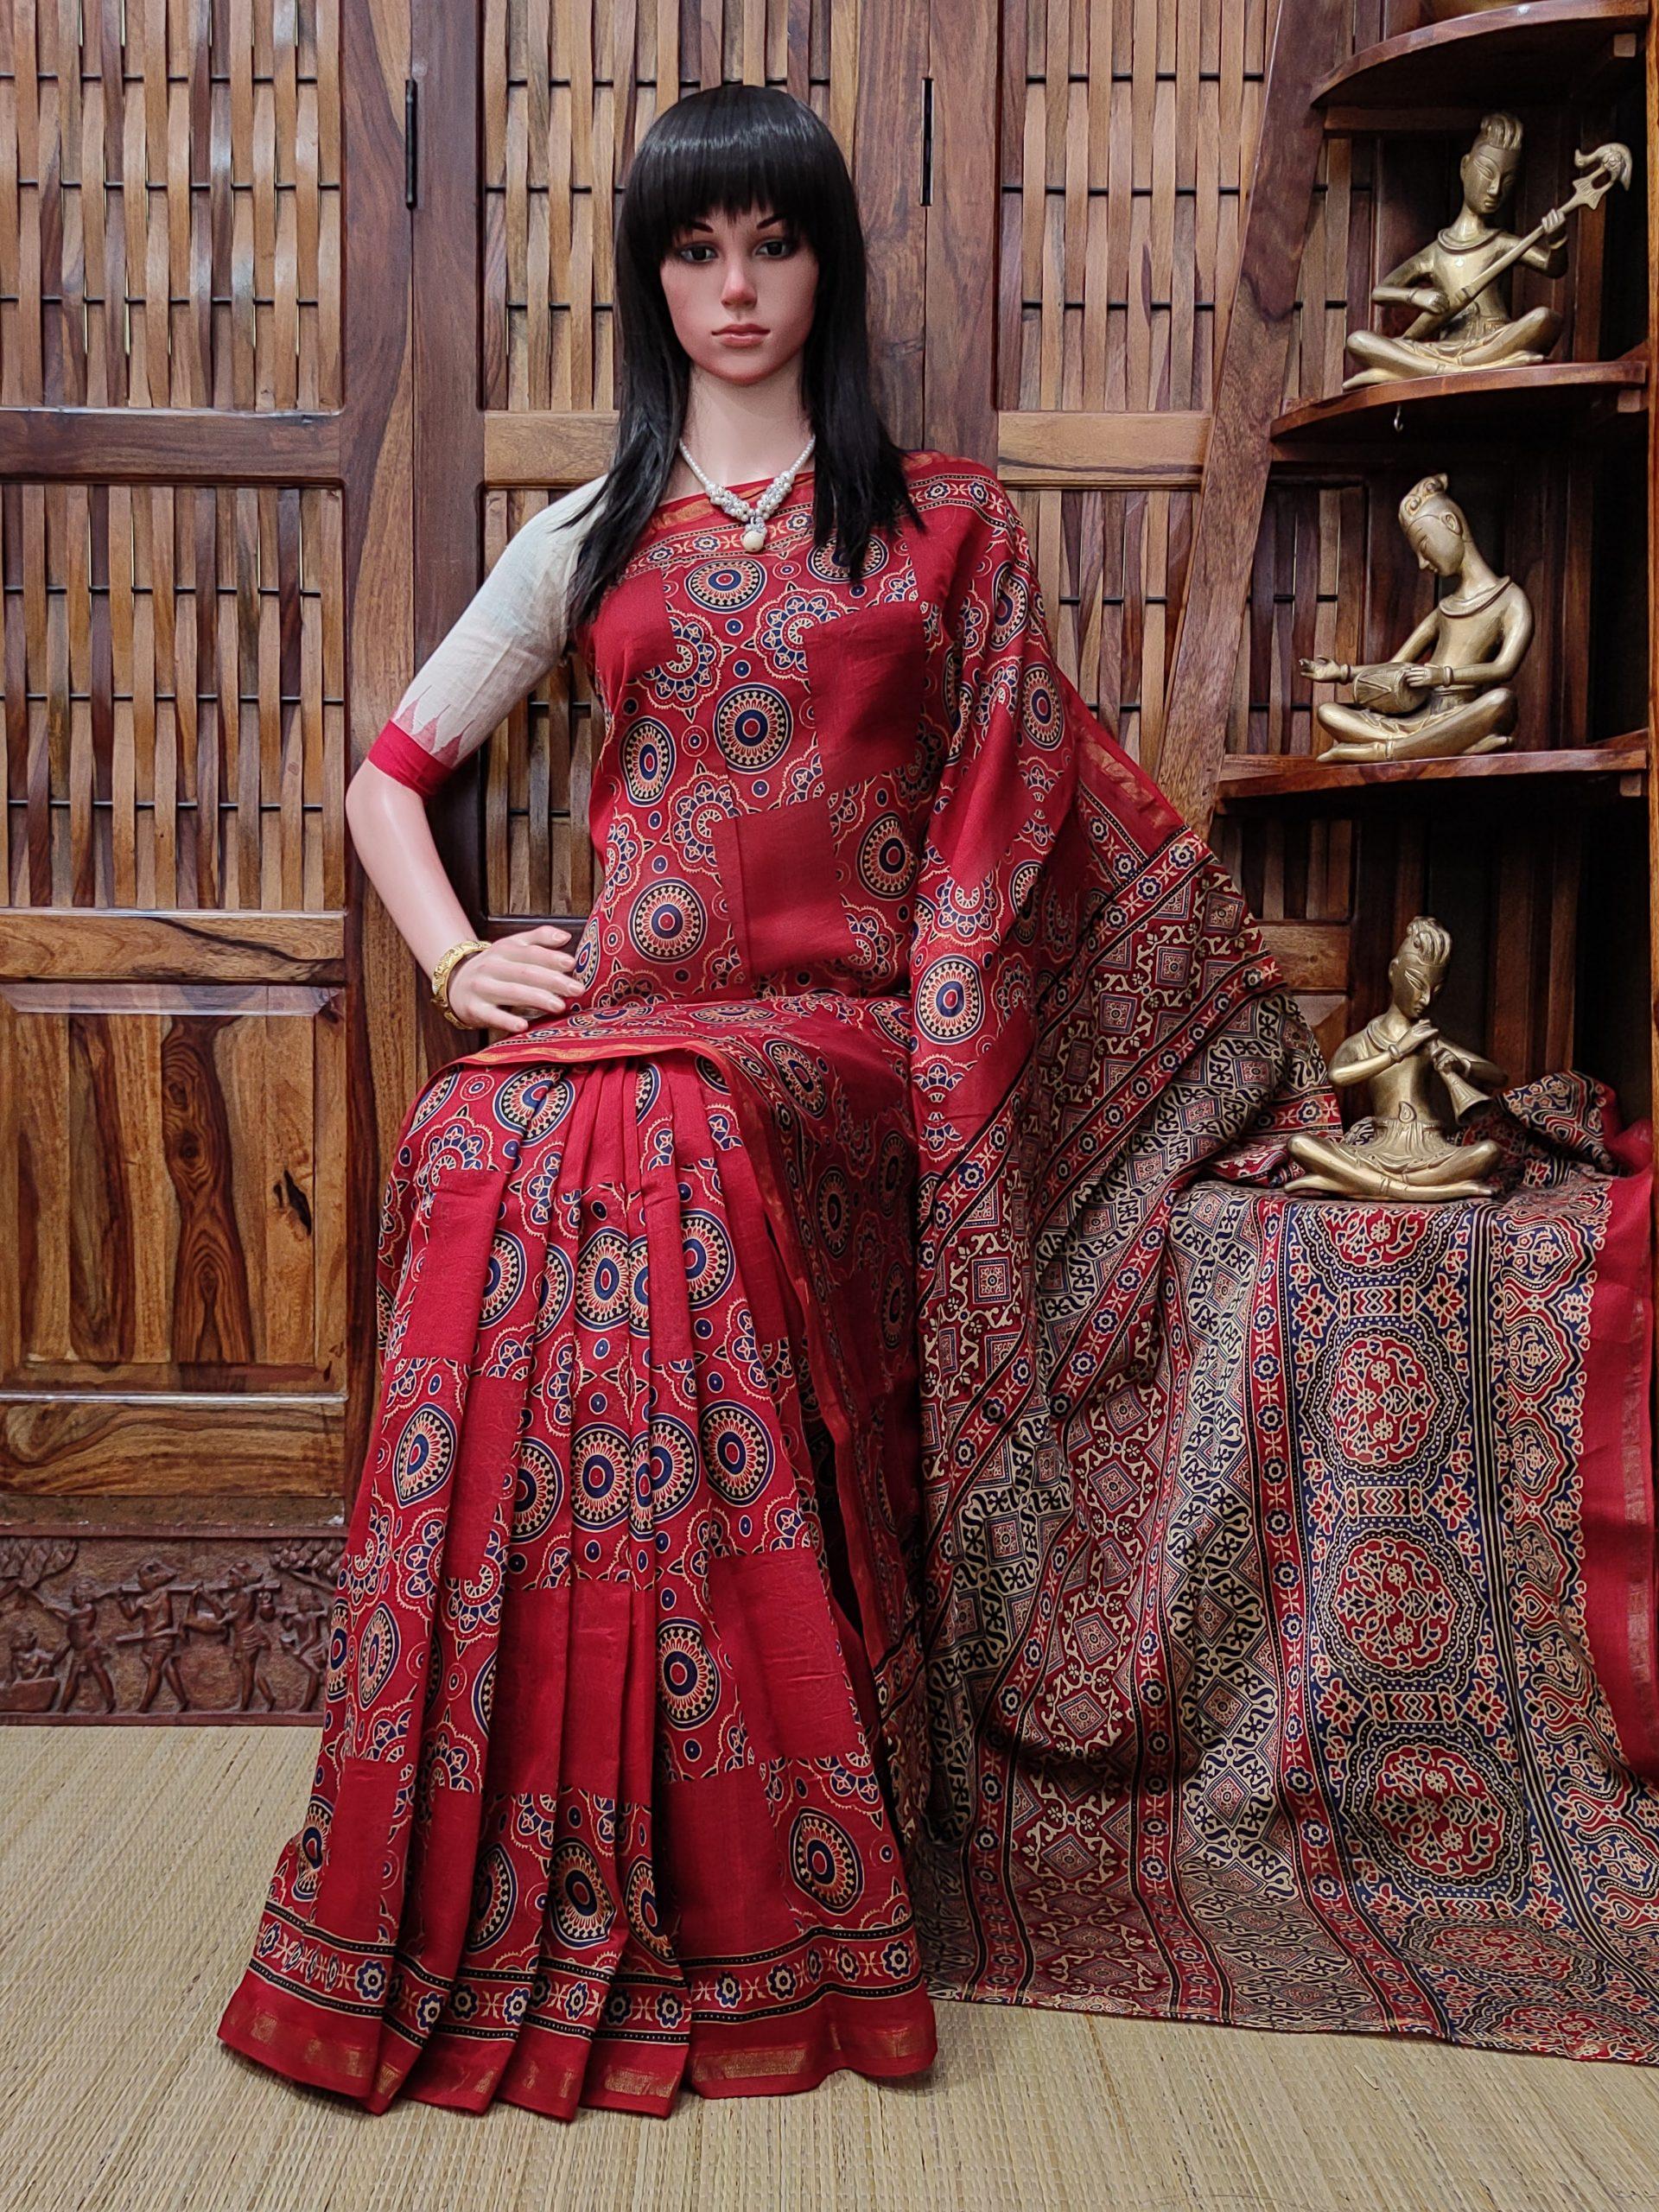 Chanasyaa - Chanderi Sico Saree